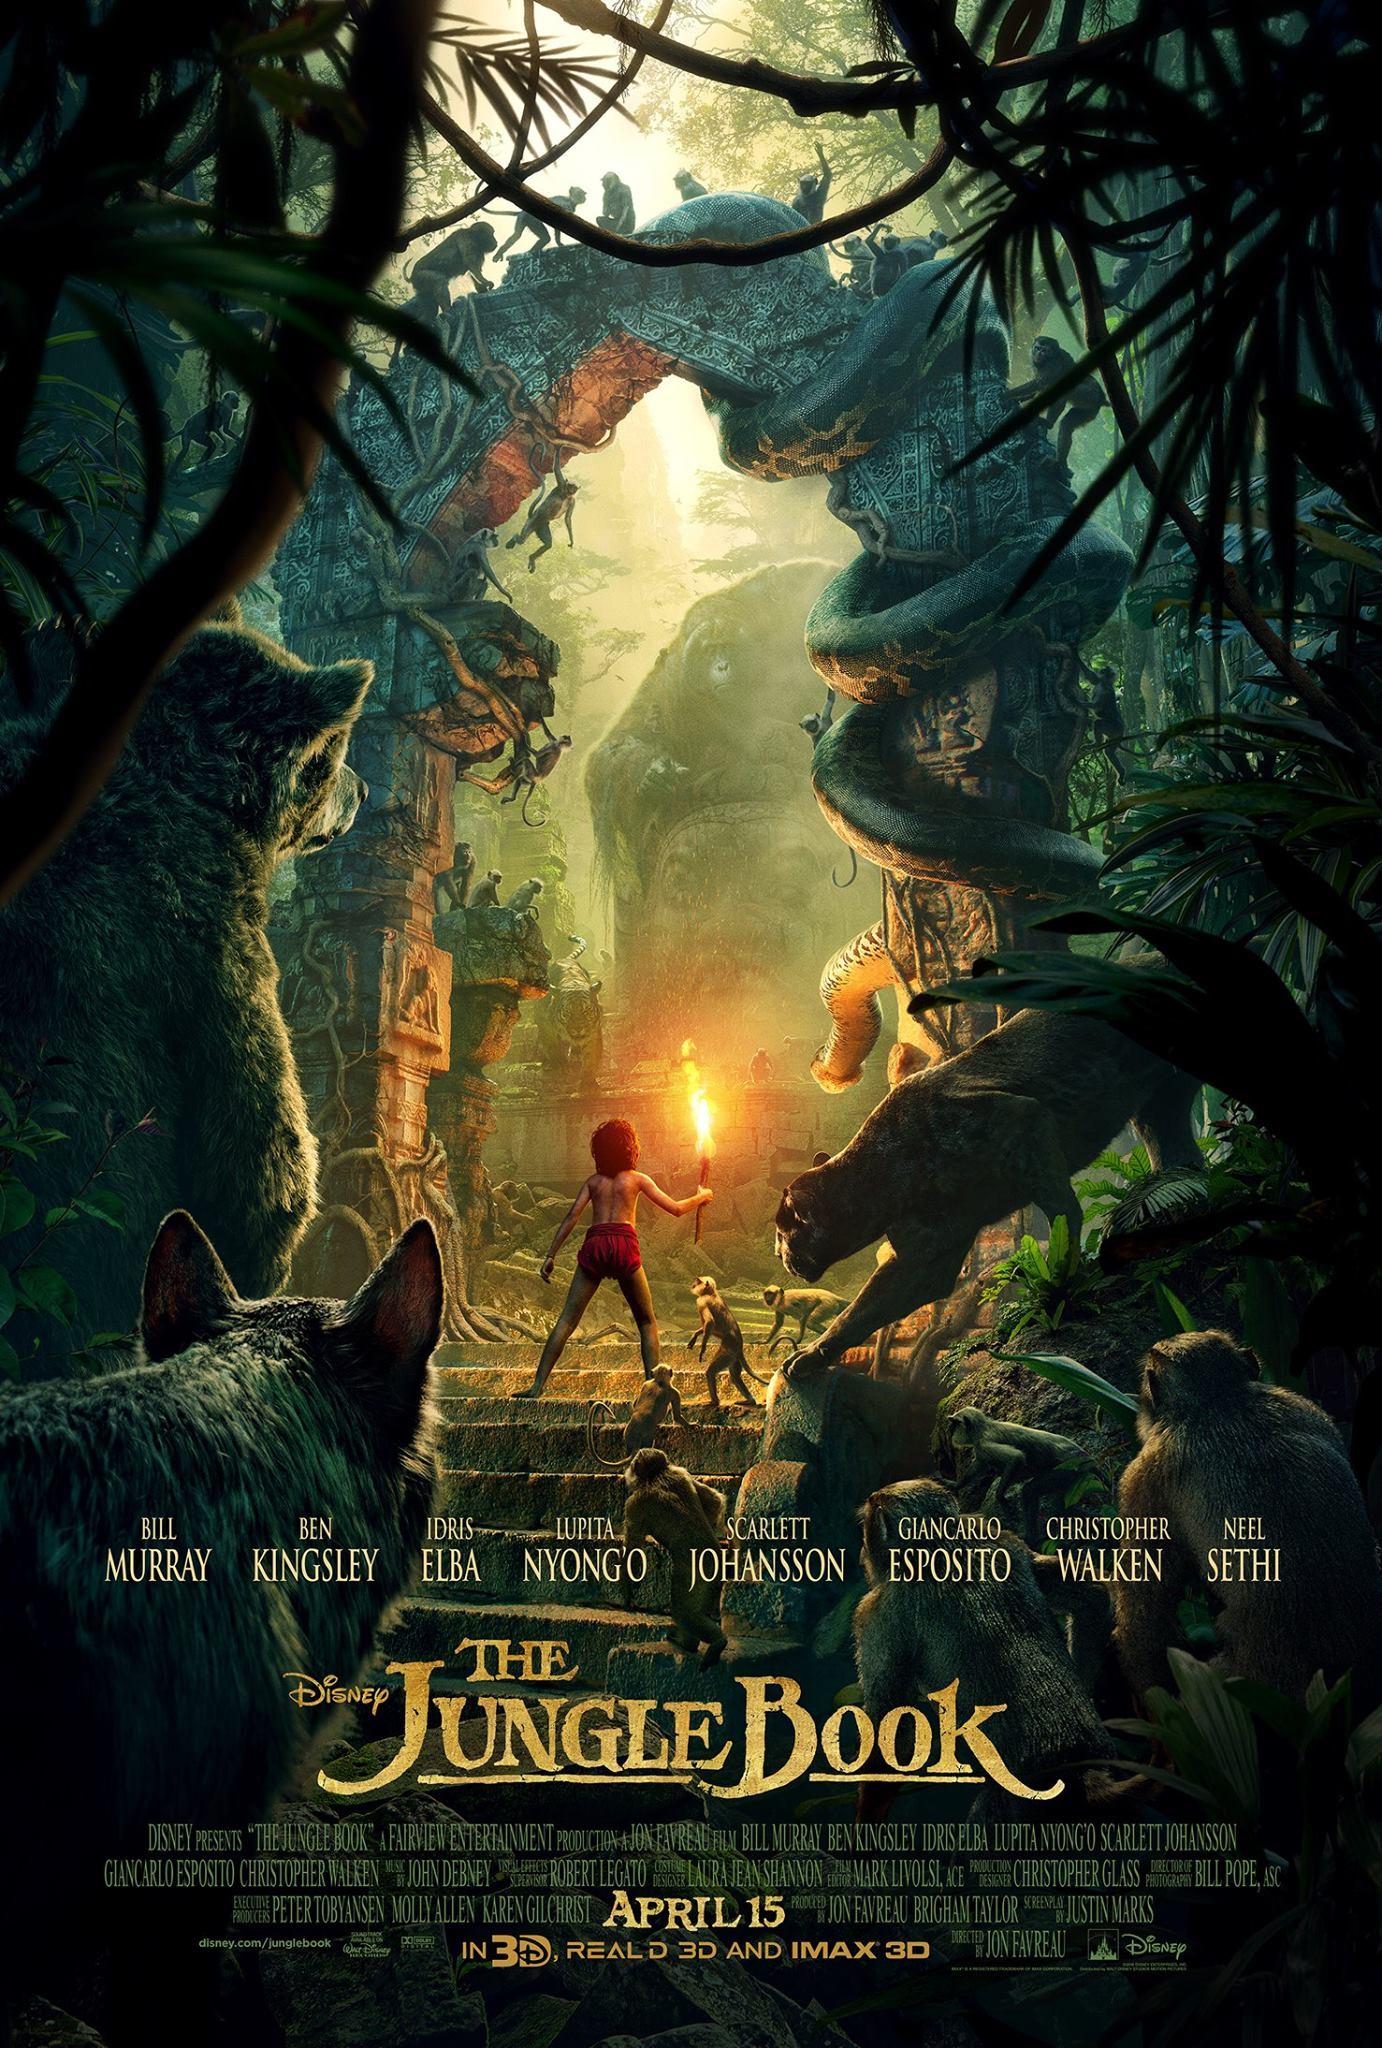 The Jungle Book 2016 film The Jungle